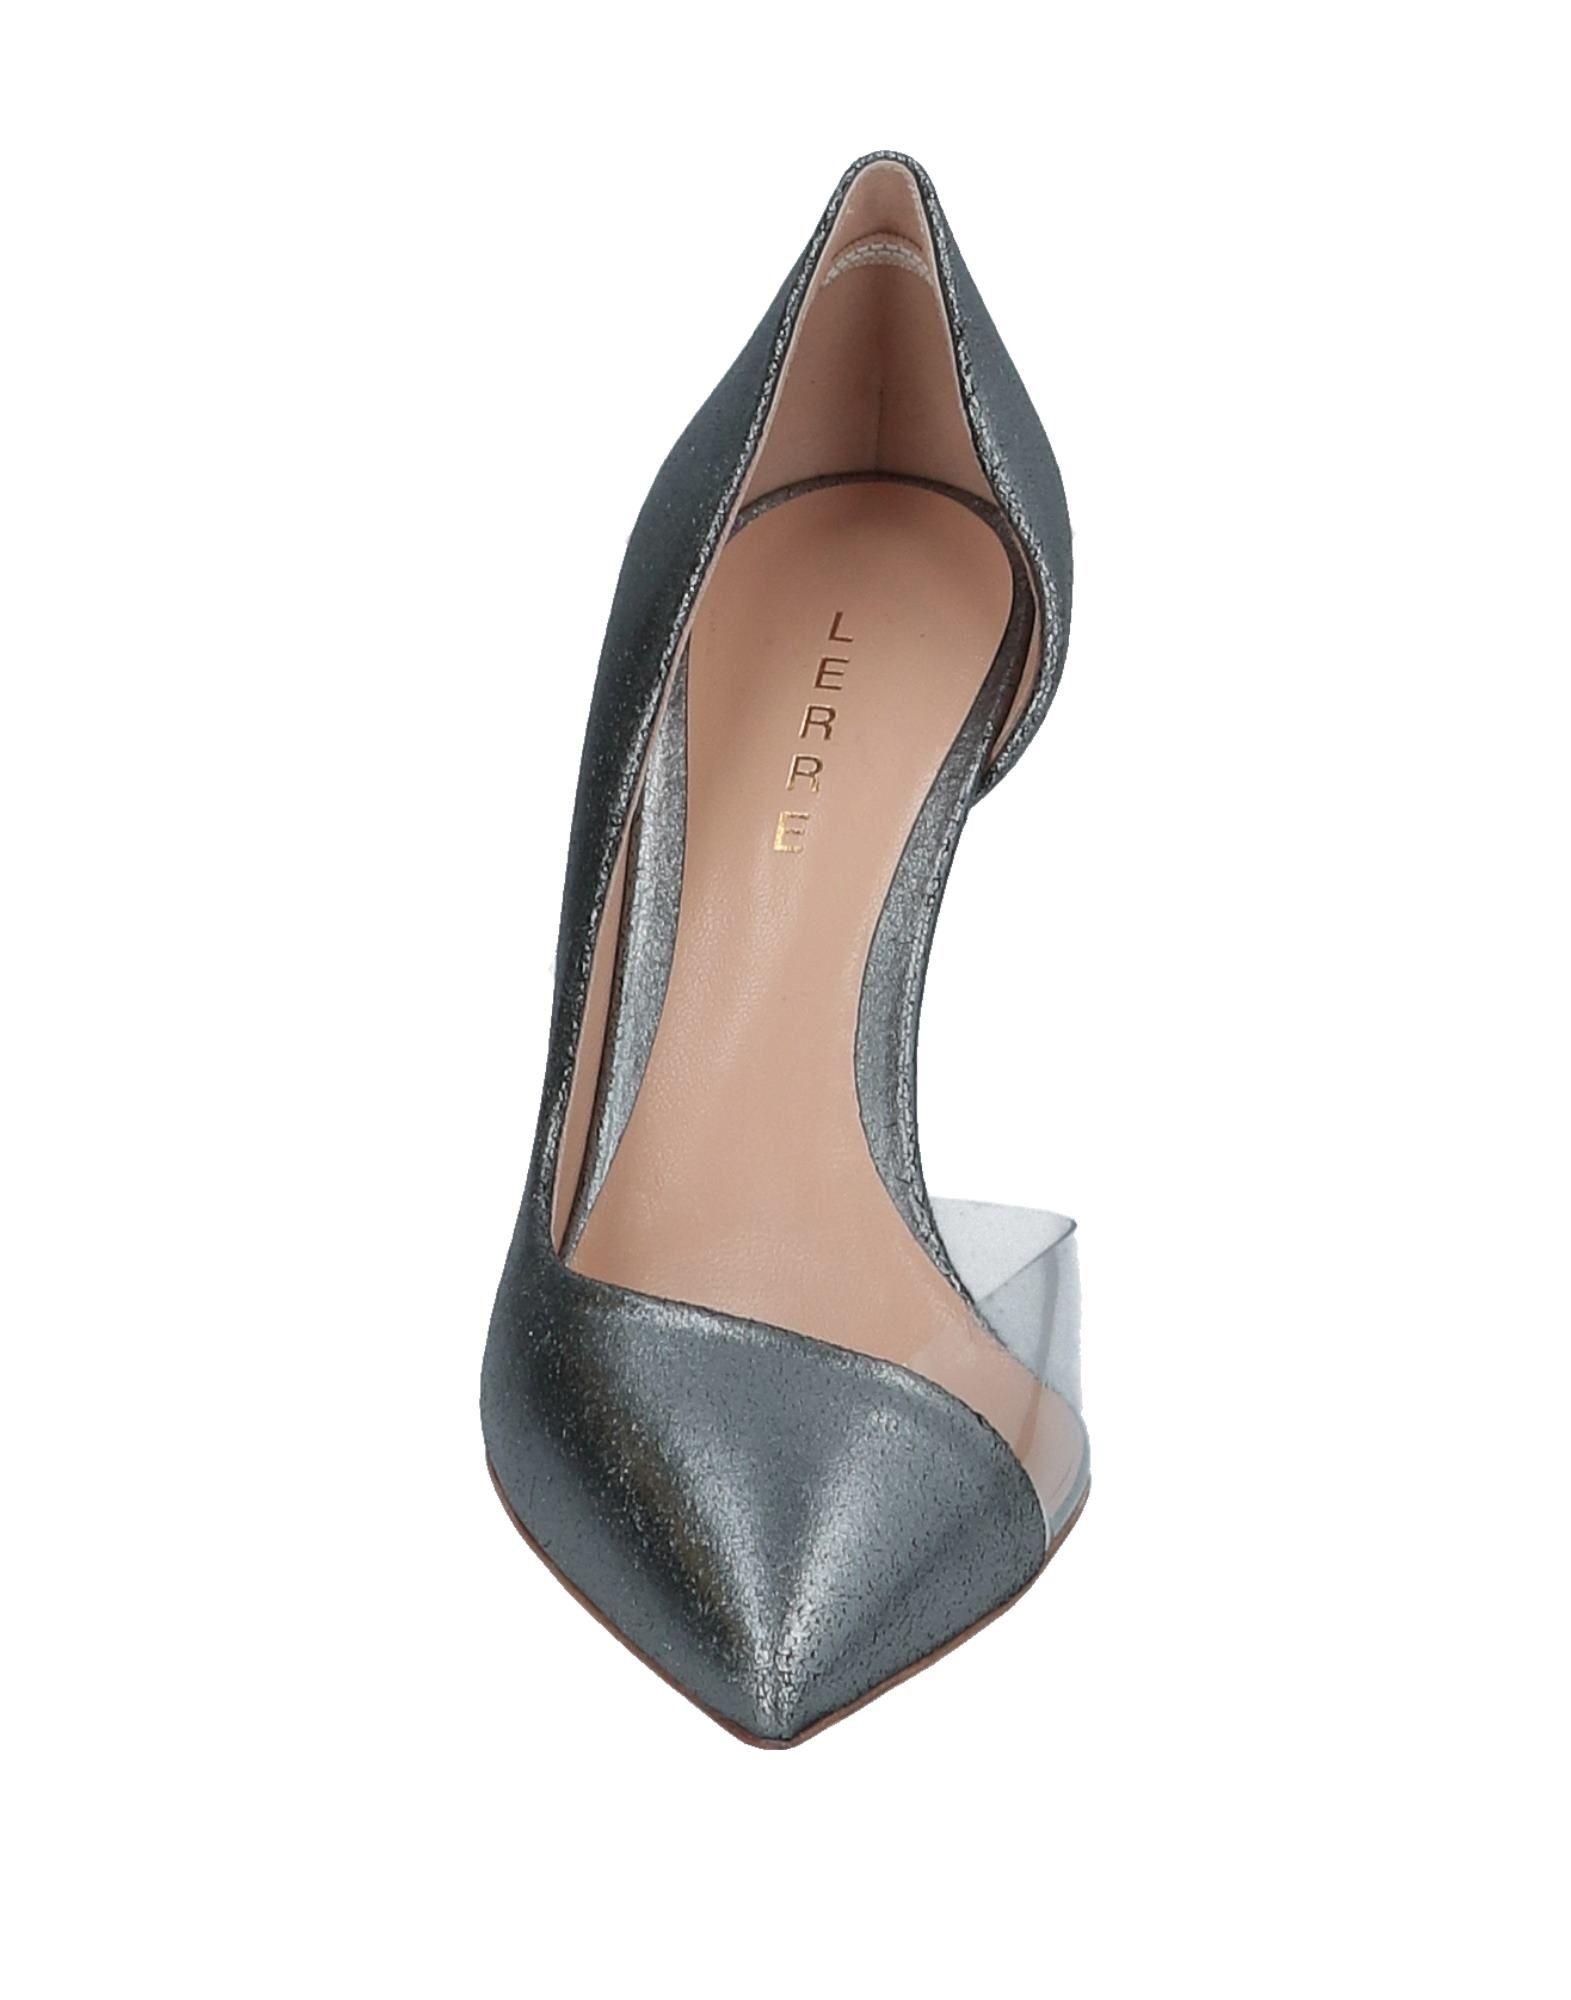 Rabatt Schuhe 11508639PV Lerre Pumps Damen  11508639PV Schuhe 92323d